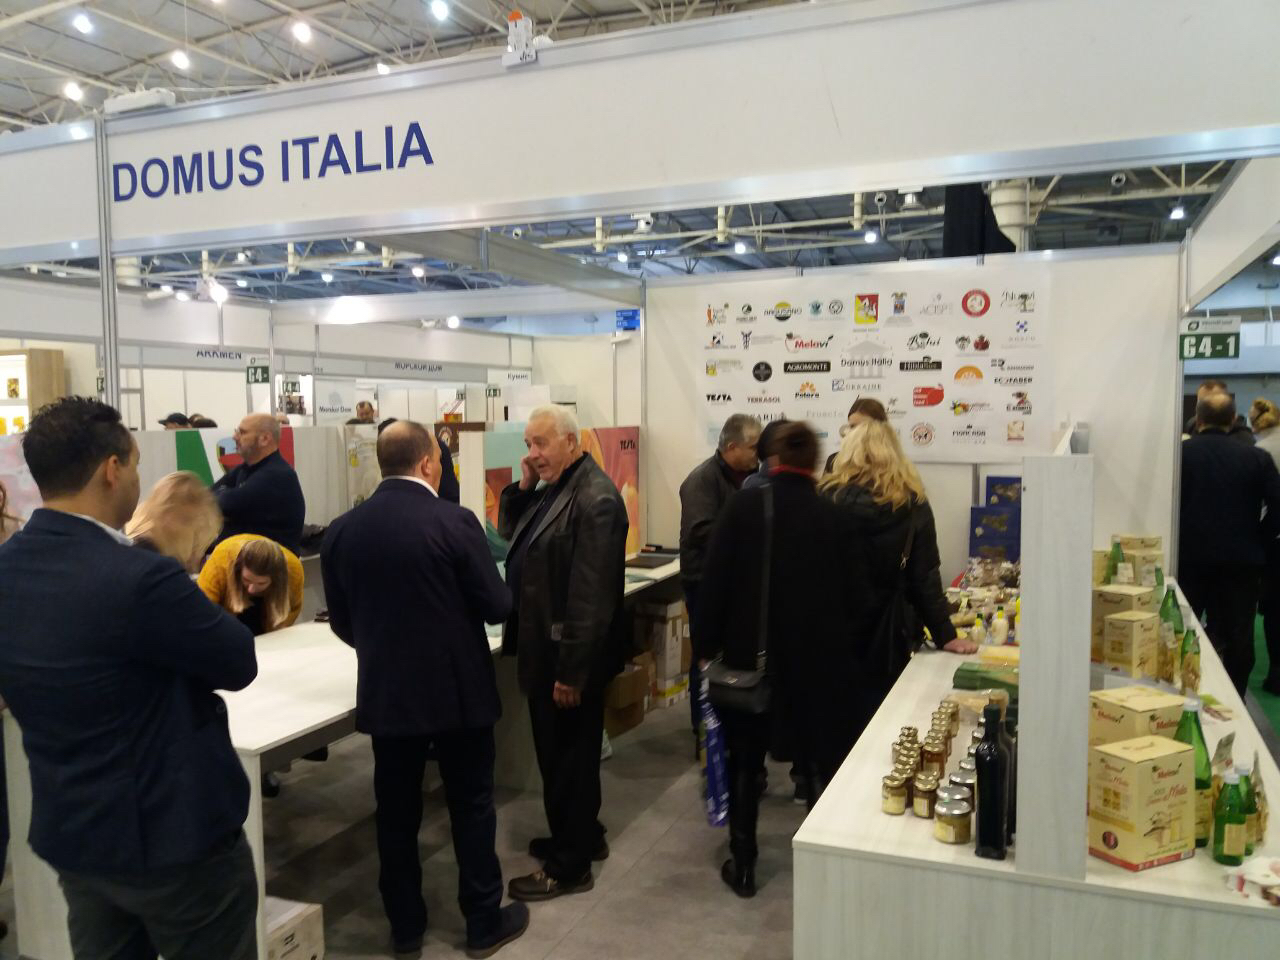 Domus-Italy-partner-miss-fashion-italy-international-models-fashionshow